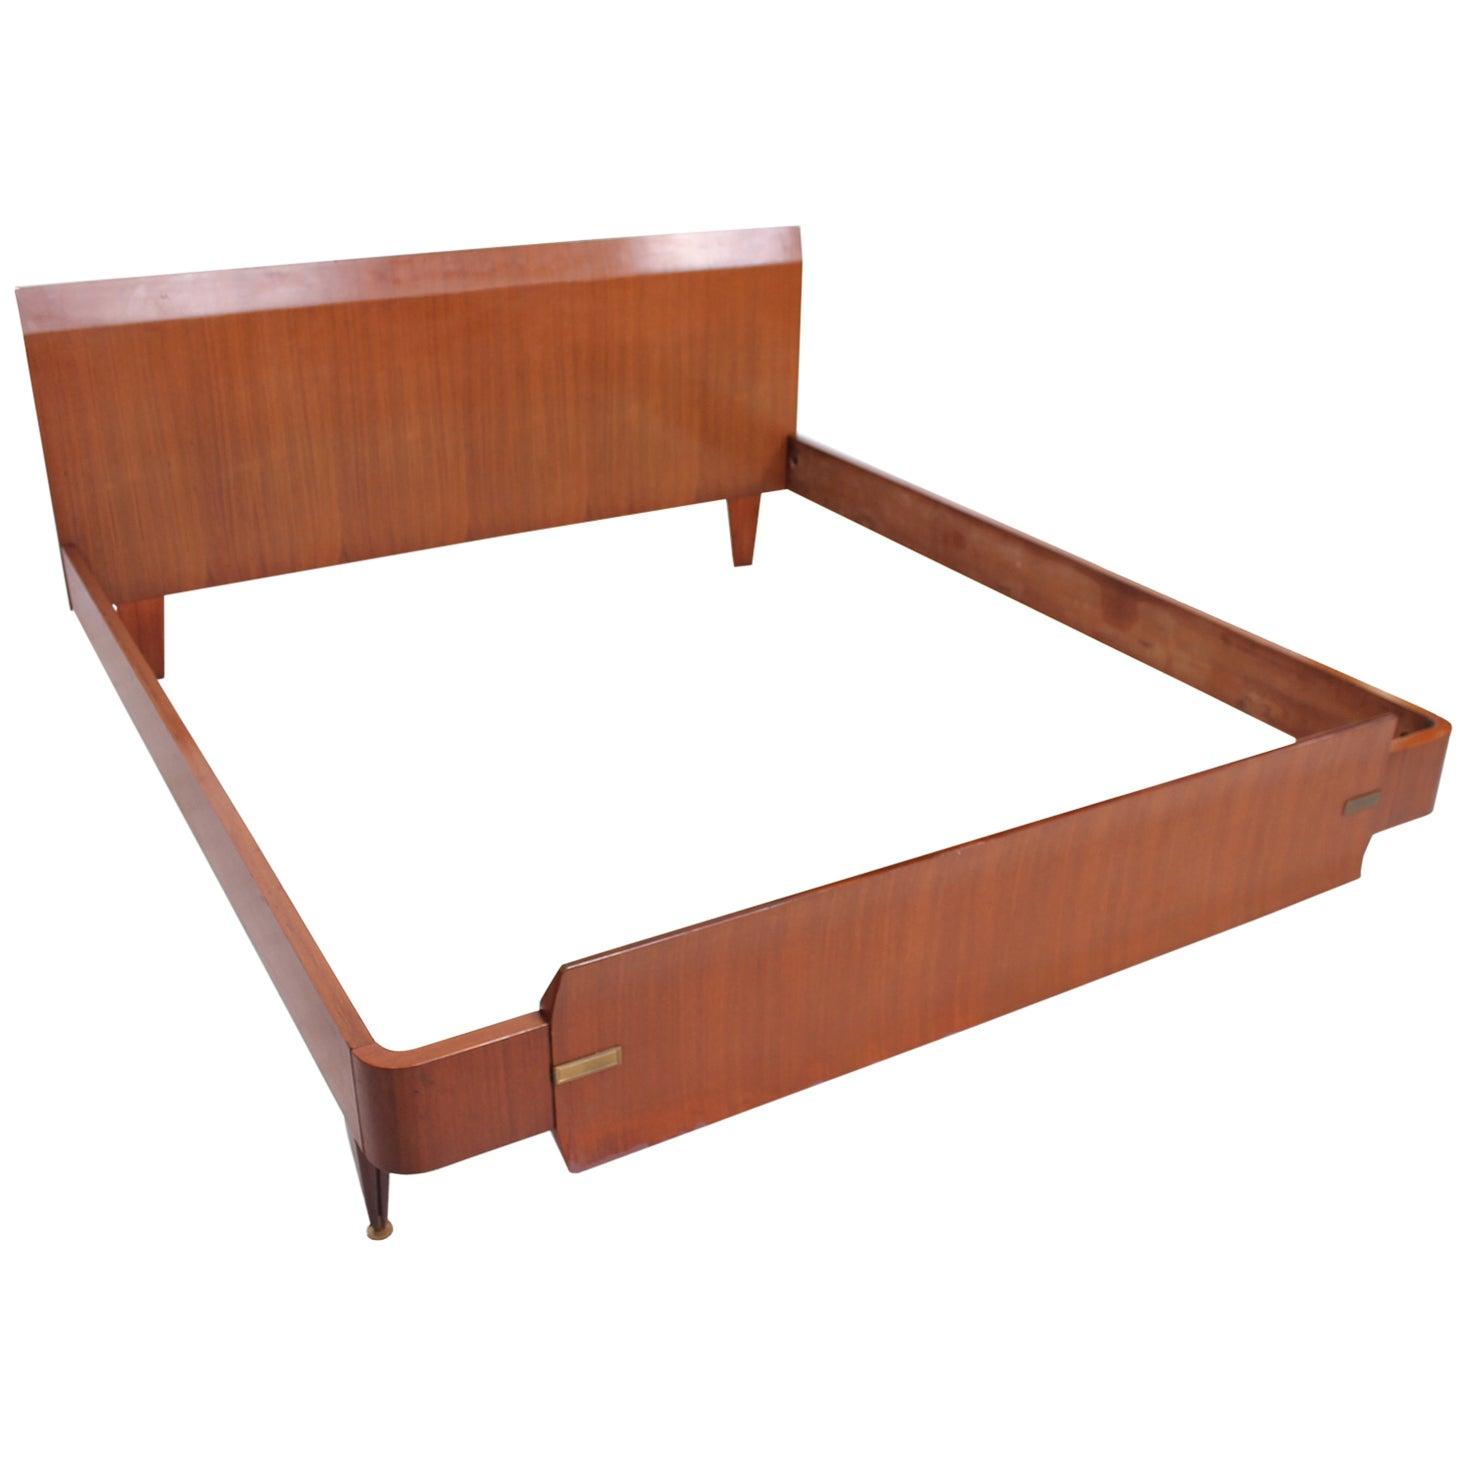 Mid Century Modern Italian Modern Bed Frame, Dassi Attributed